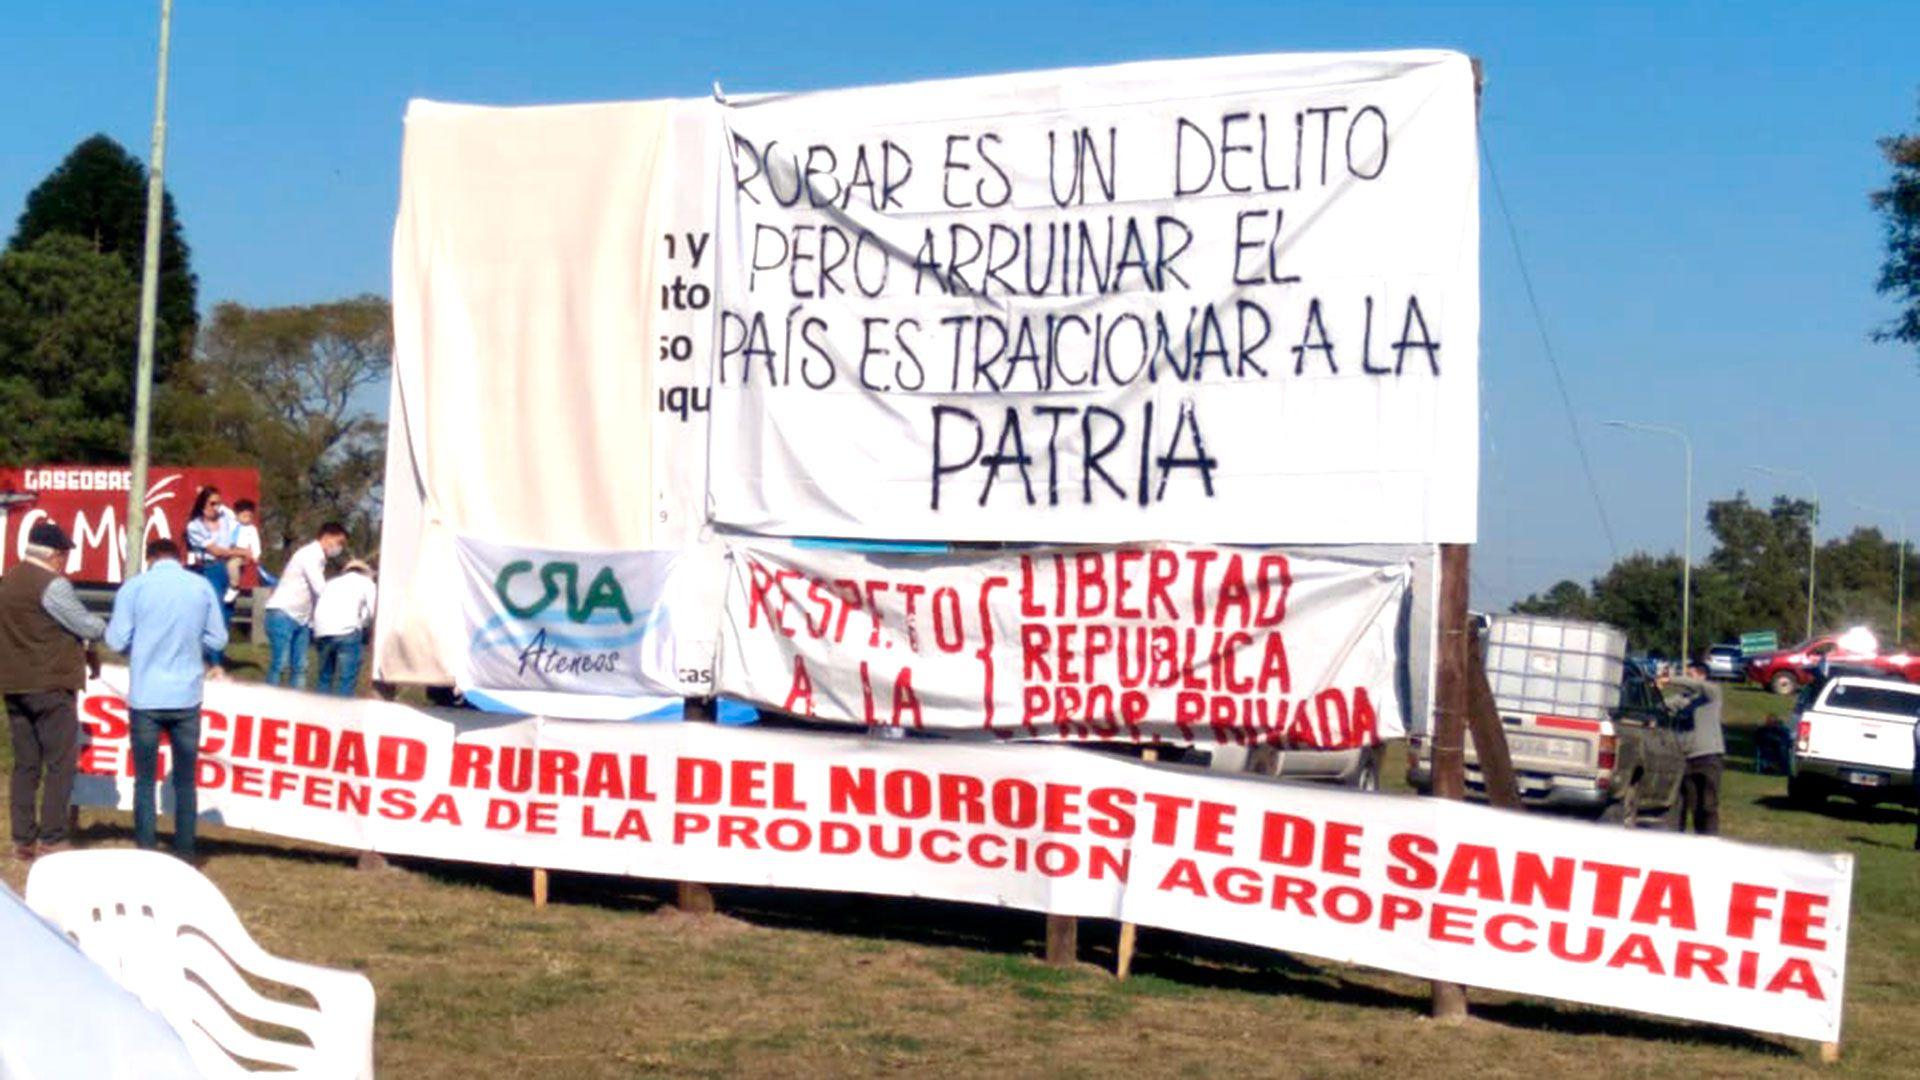 Campo Manifestacion 9 de Julio Reconquista Avellaneda